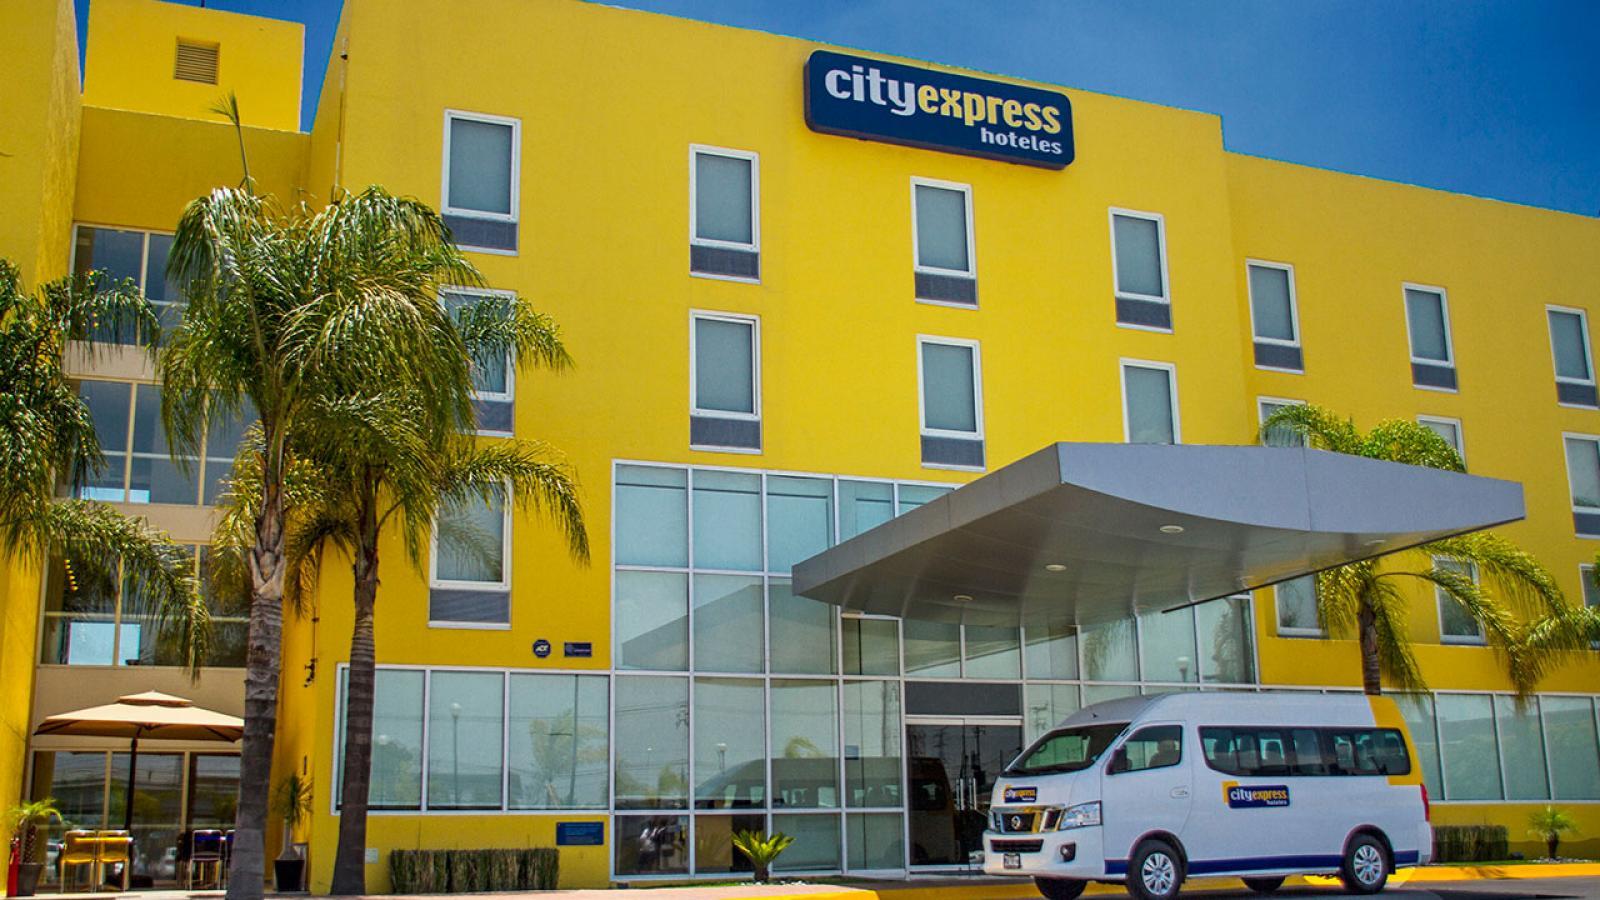 City Express Tepotzotl Hoteles